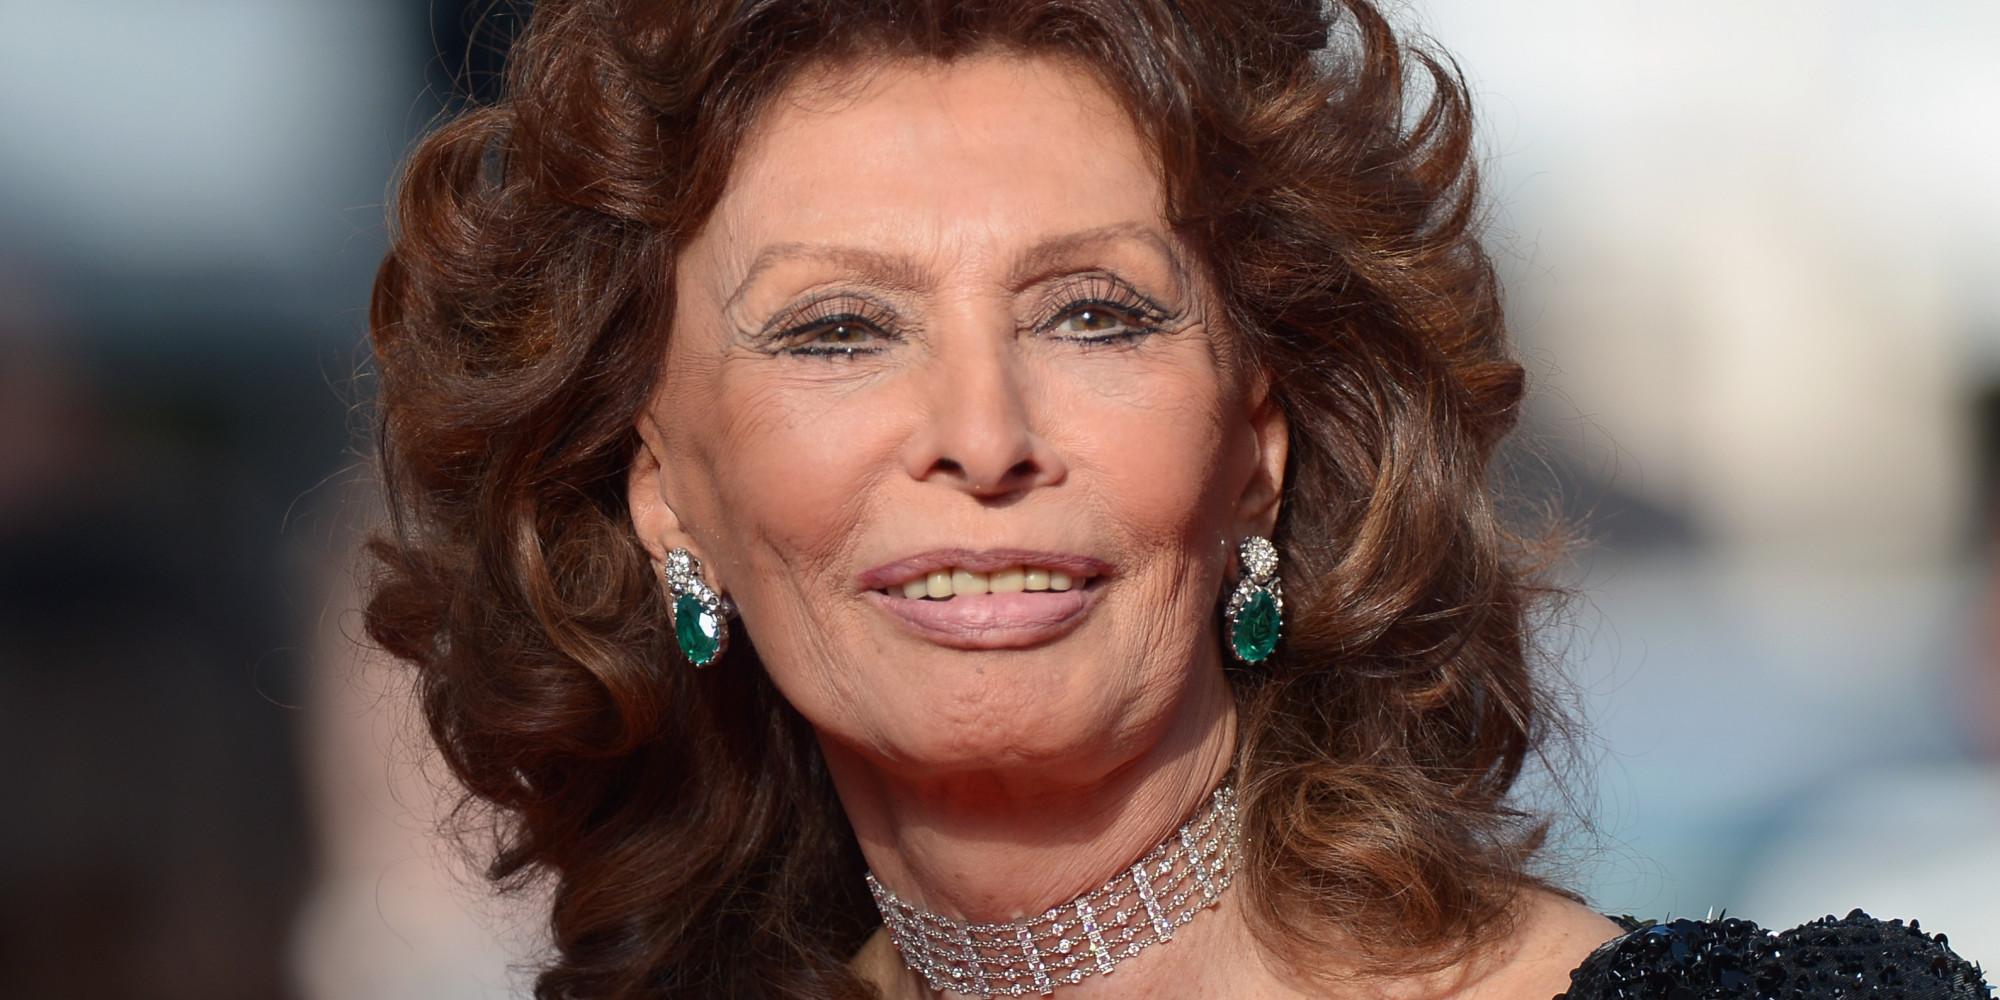 tips sophia loren 2017s alternative hair style of the beautiful cute actress - Sophia Loren Hair Color